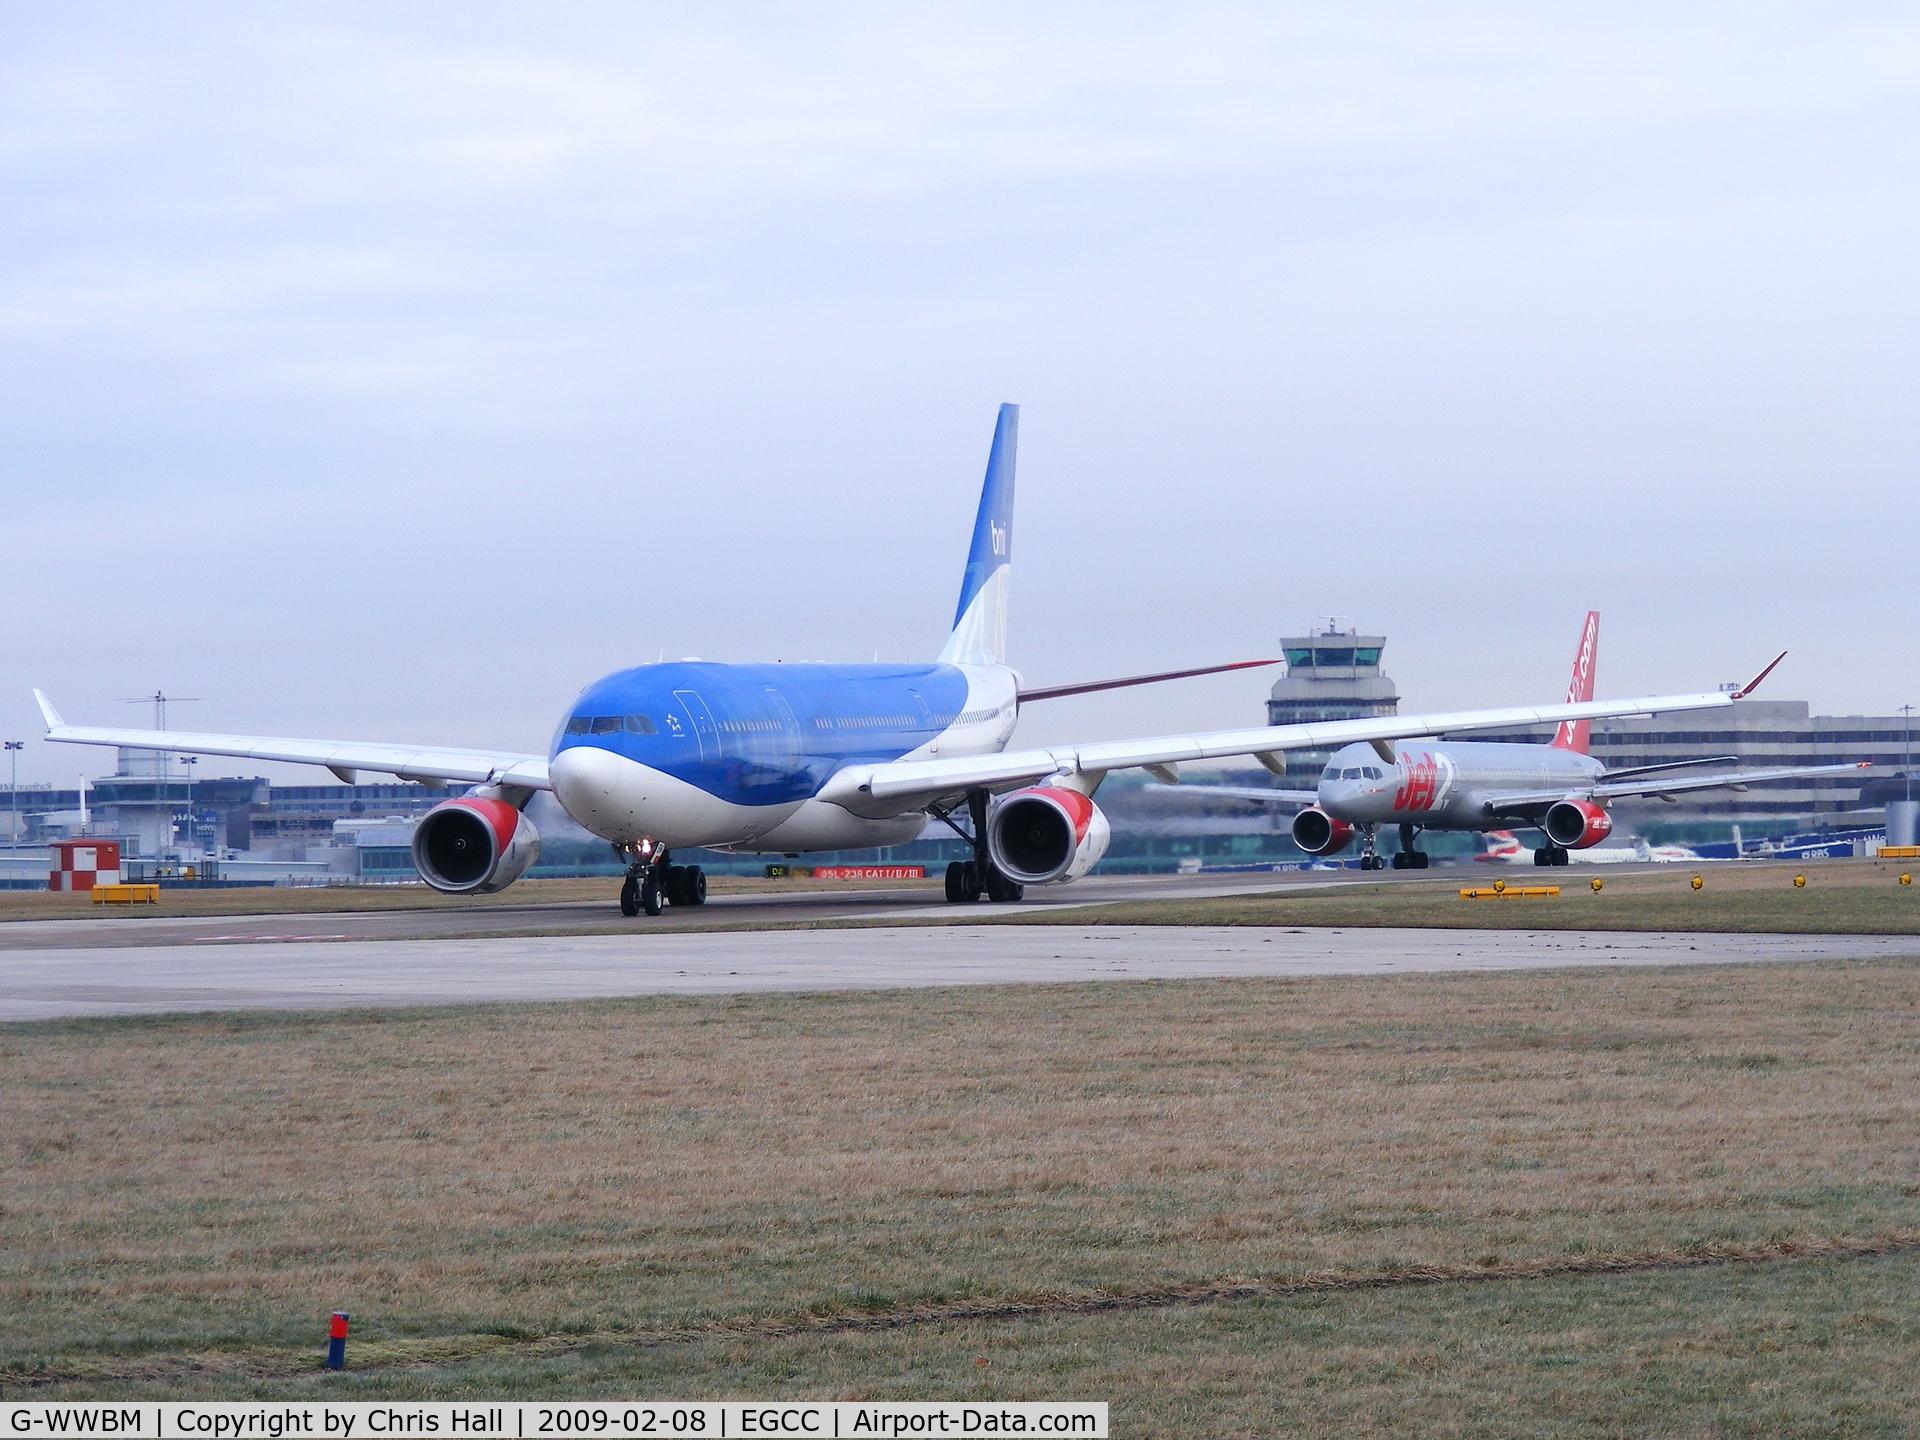 G-WWBM, 2001 Airbus A330-243 C/N 398, BMI